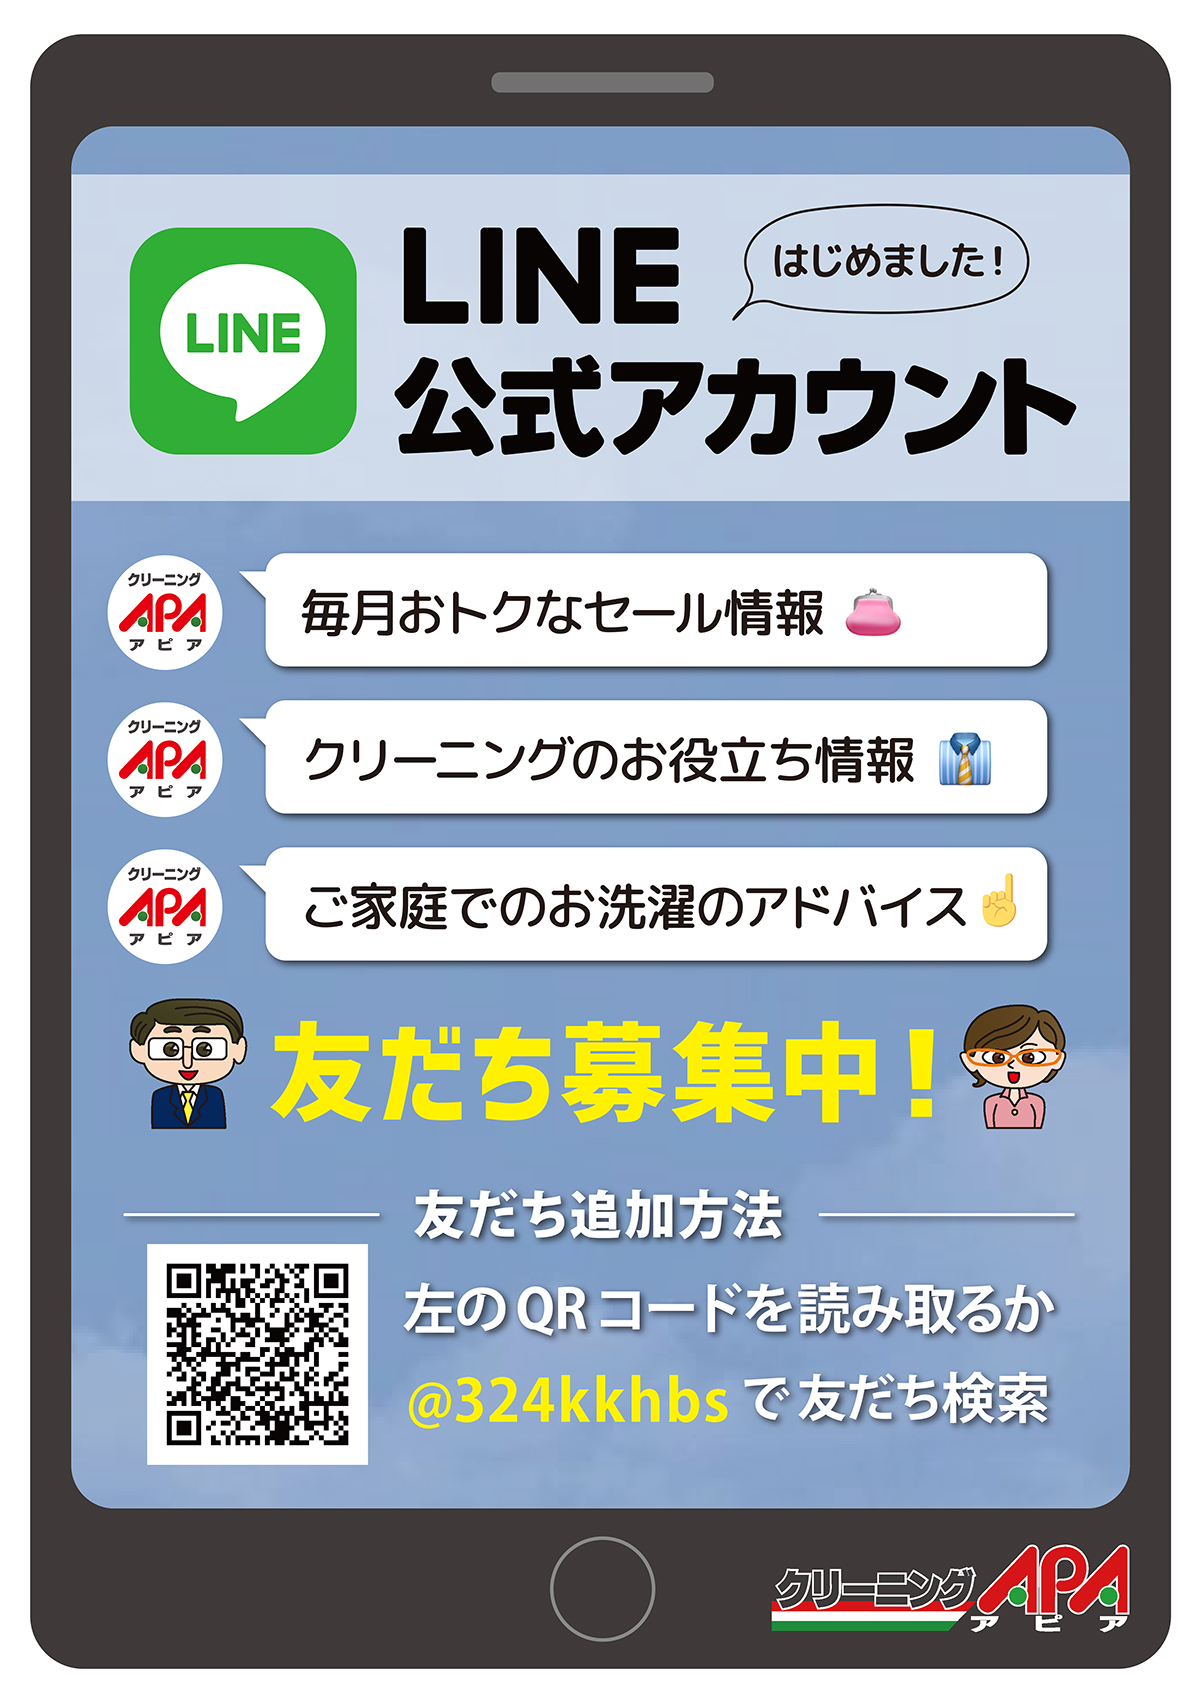 LINE公式告知ポスターC